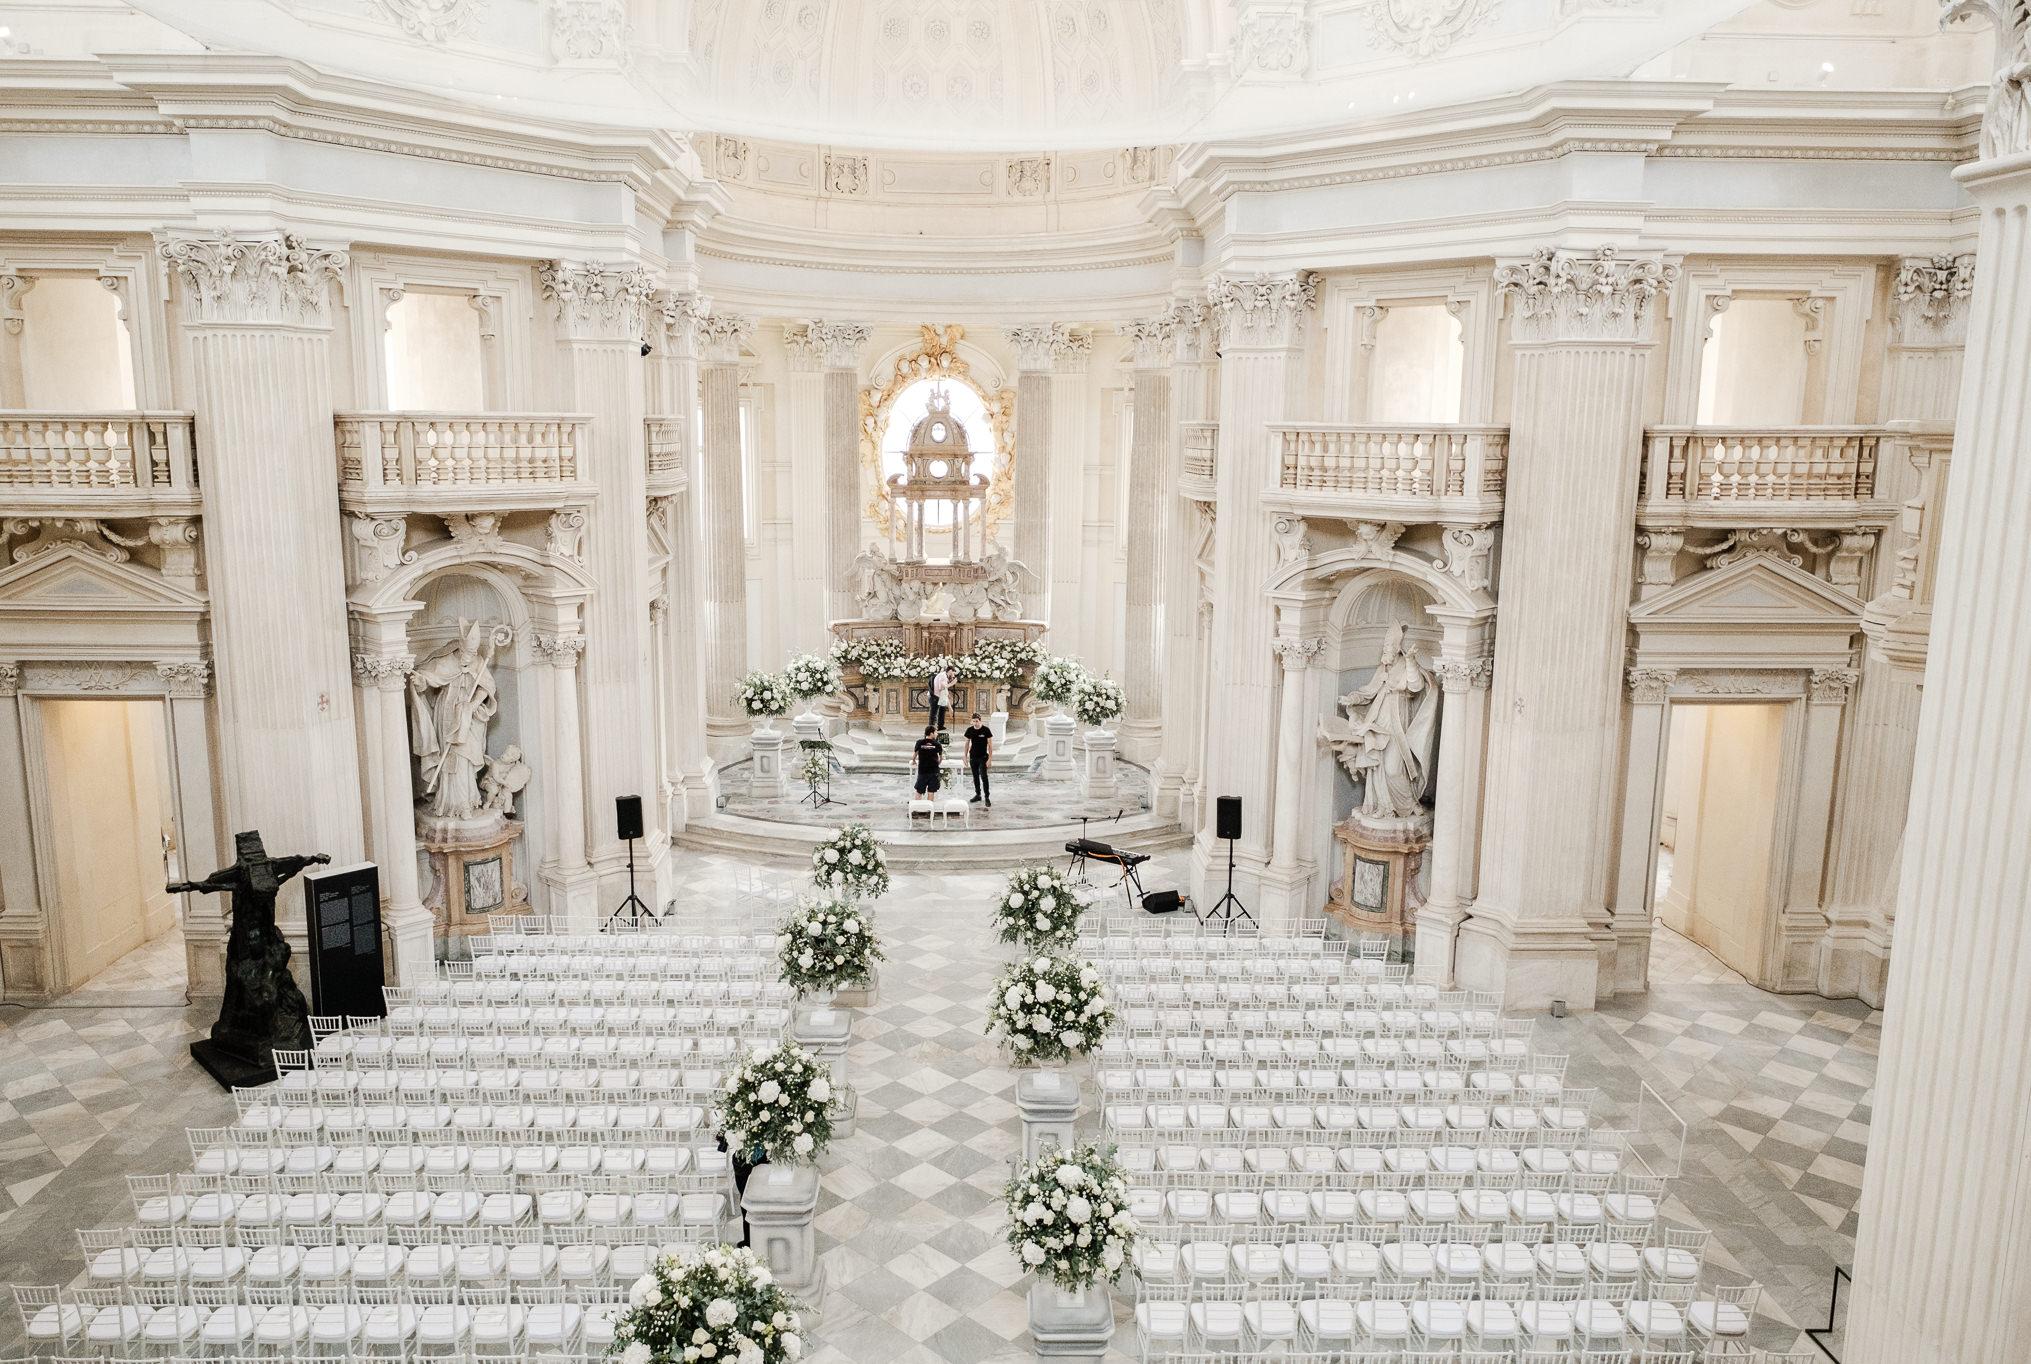 venaria reale church wedding setup